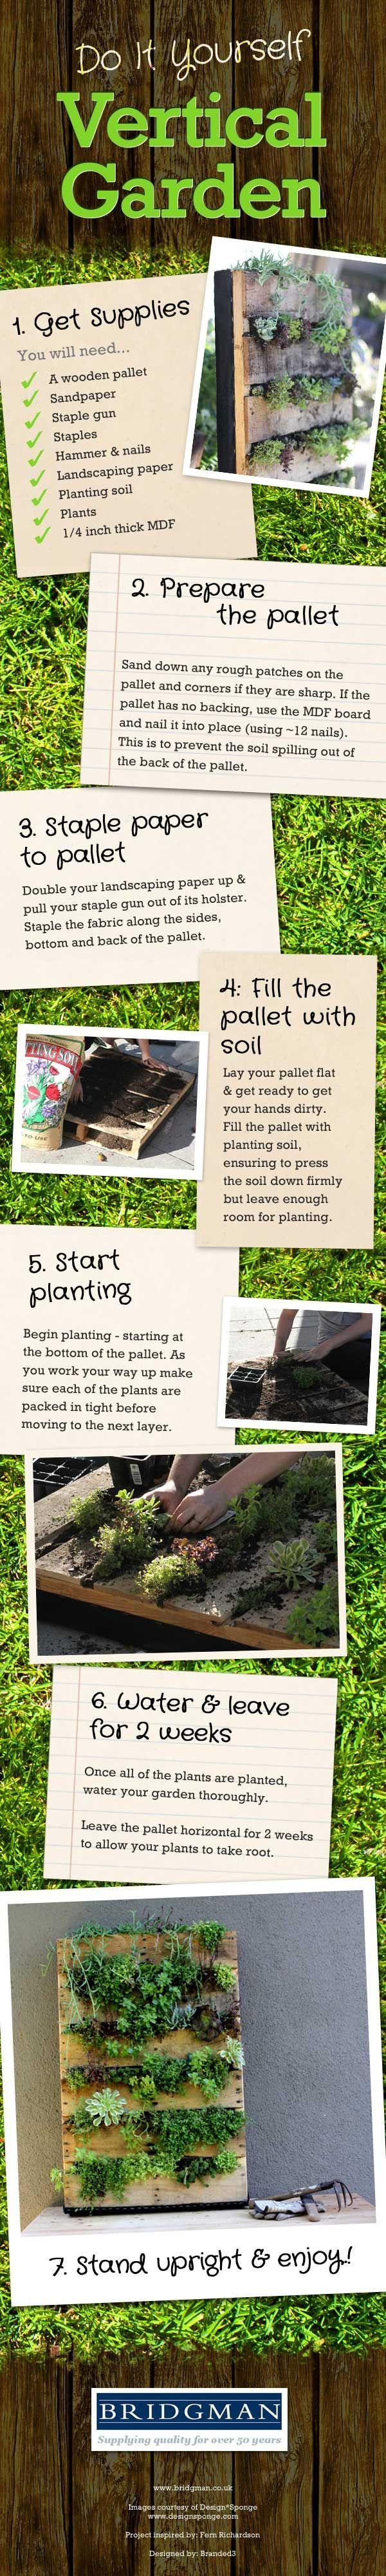 How to create a Vertical Wall Garden